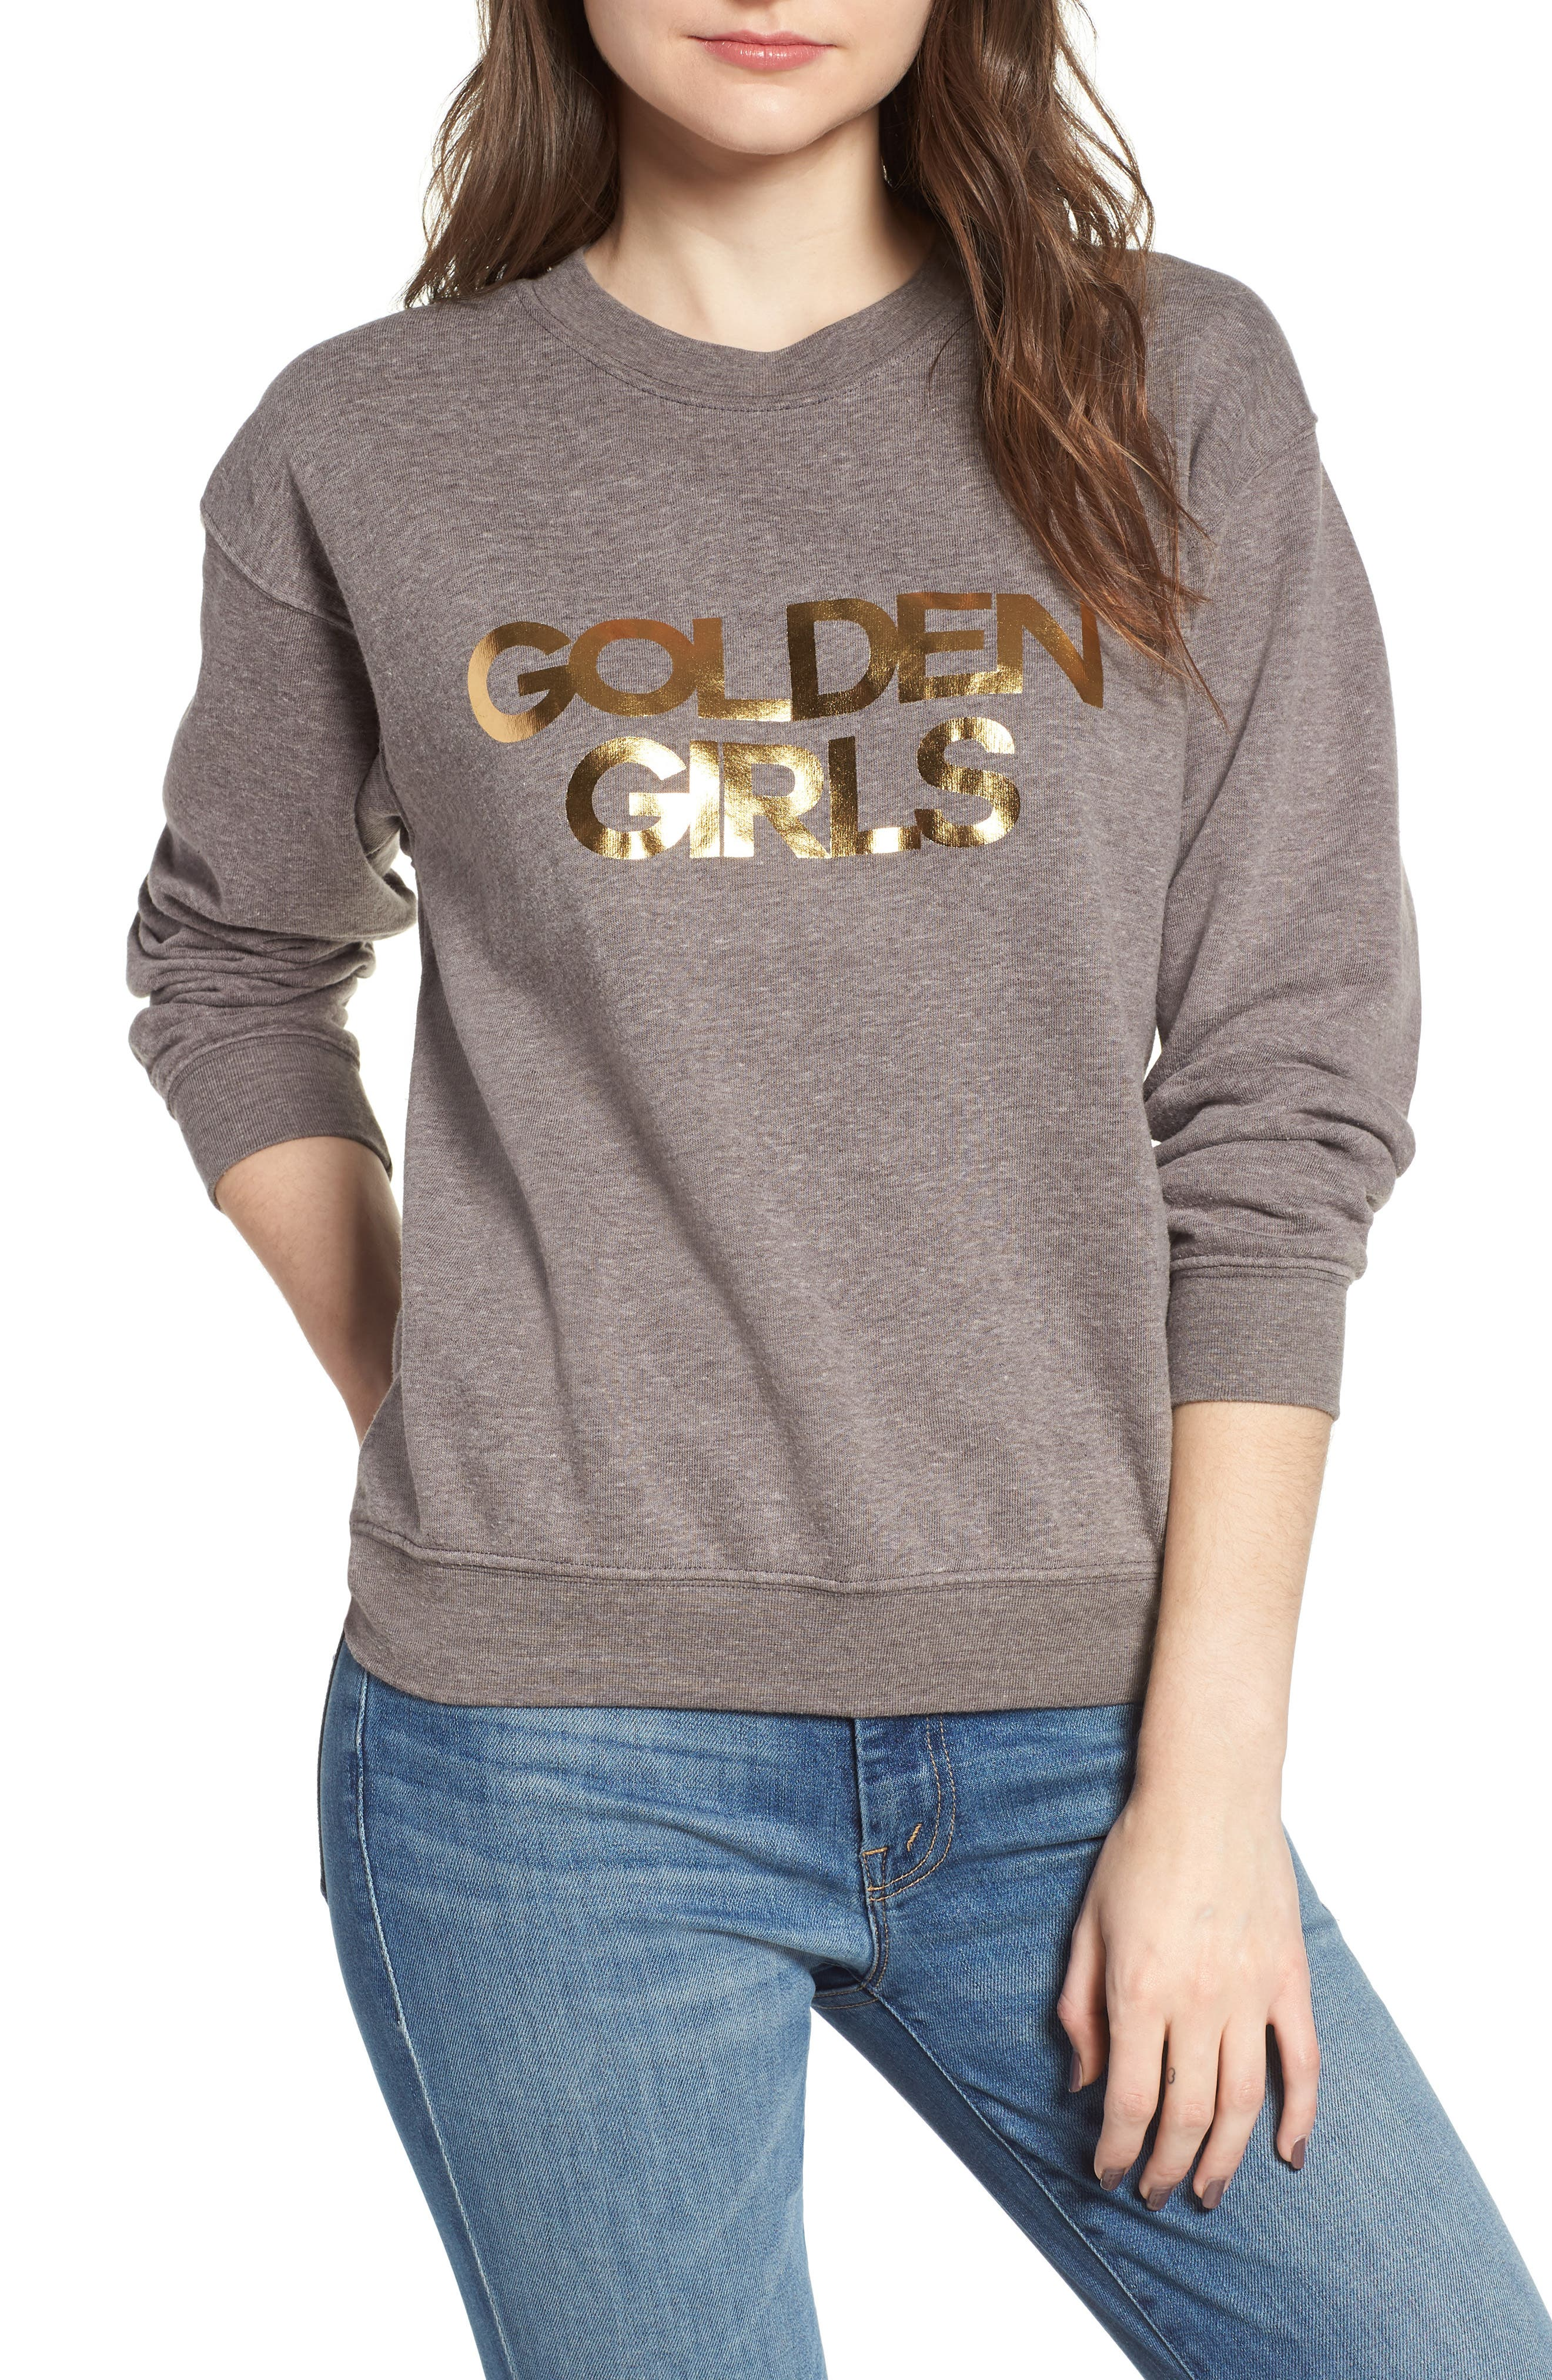 Golden Girls Willow Sweatshirt,                             Main thumbnail 1, color,                             050